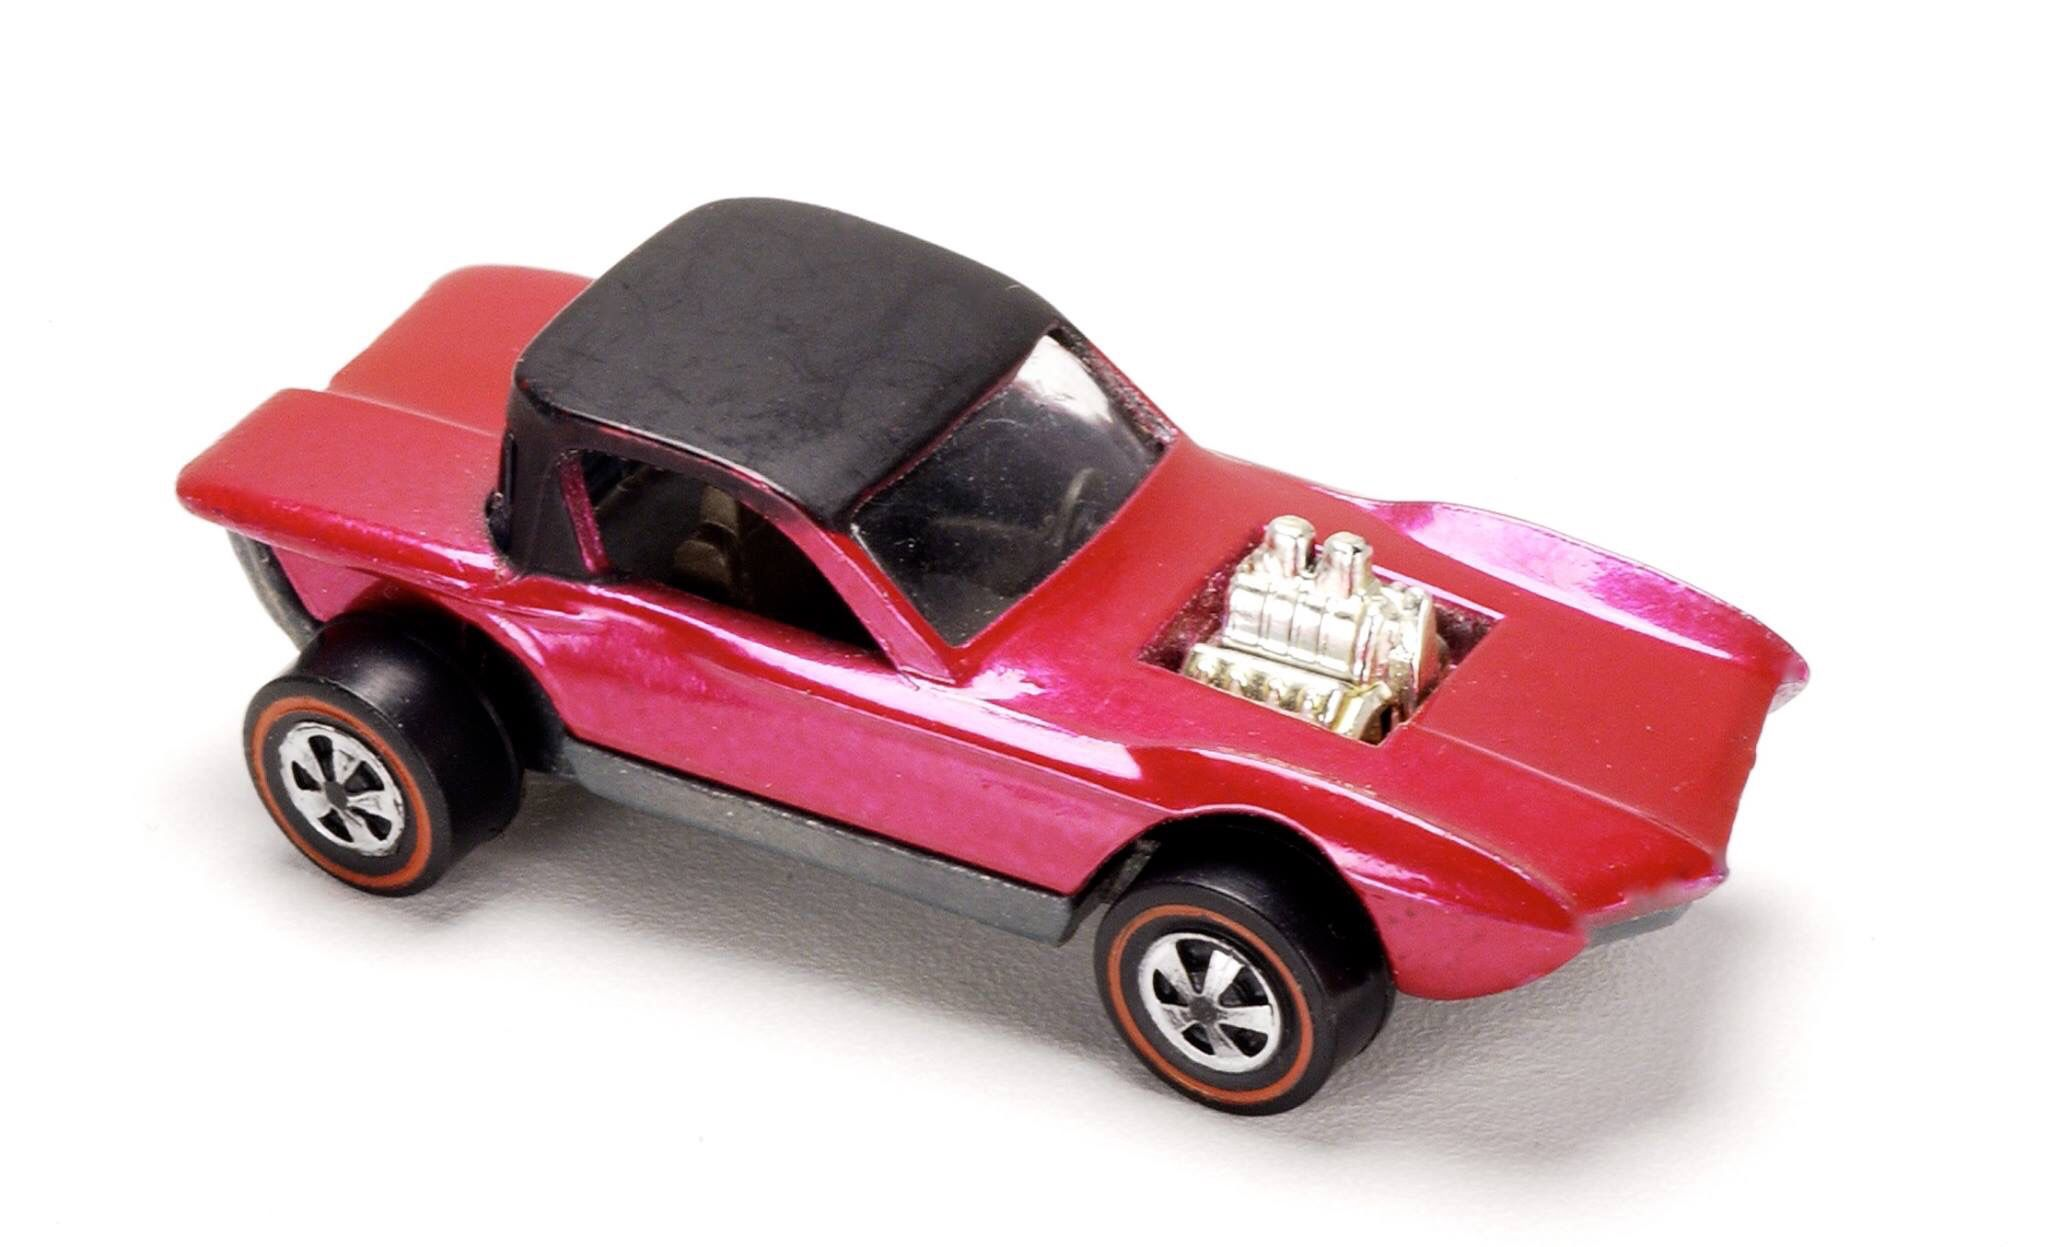 Hot Wheels Python 68 Rare Pink Hot Wheels Diecast Toy Vintage Toys